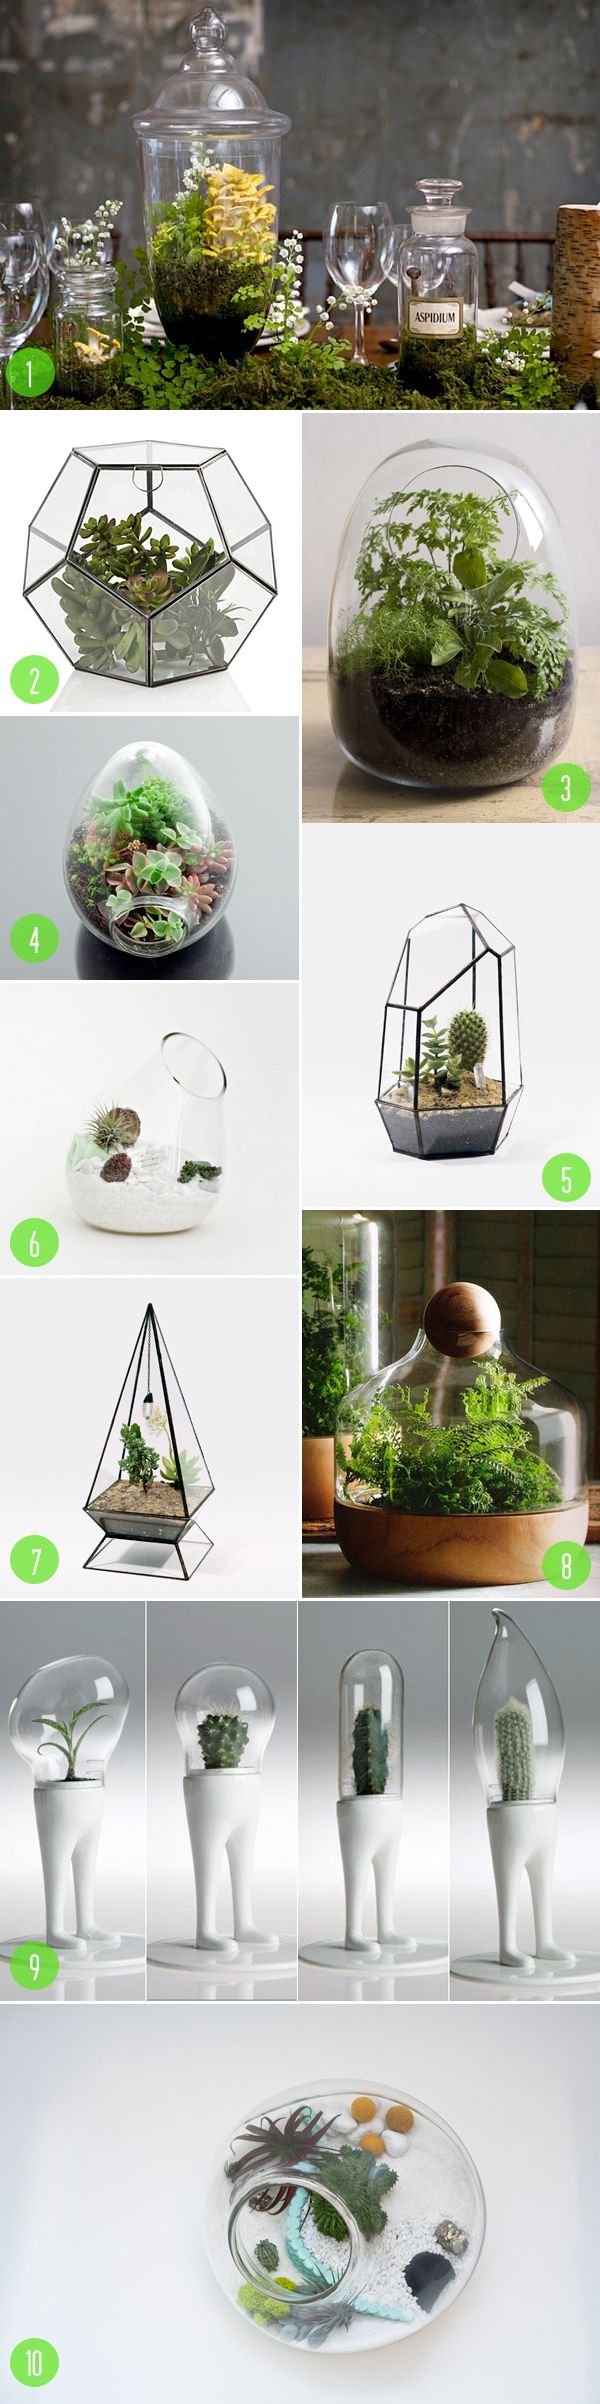 top 10: terrariums